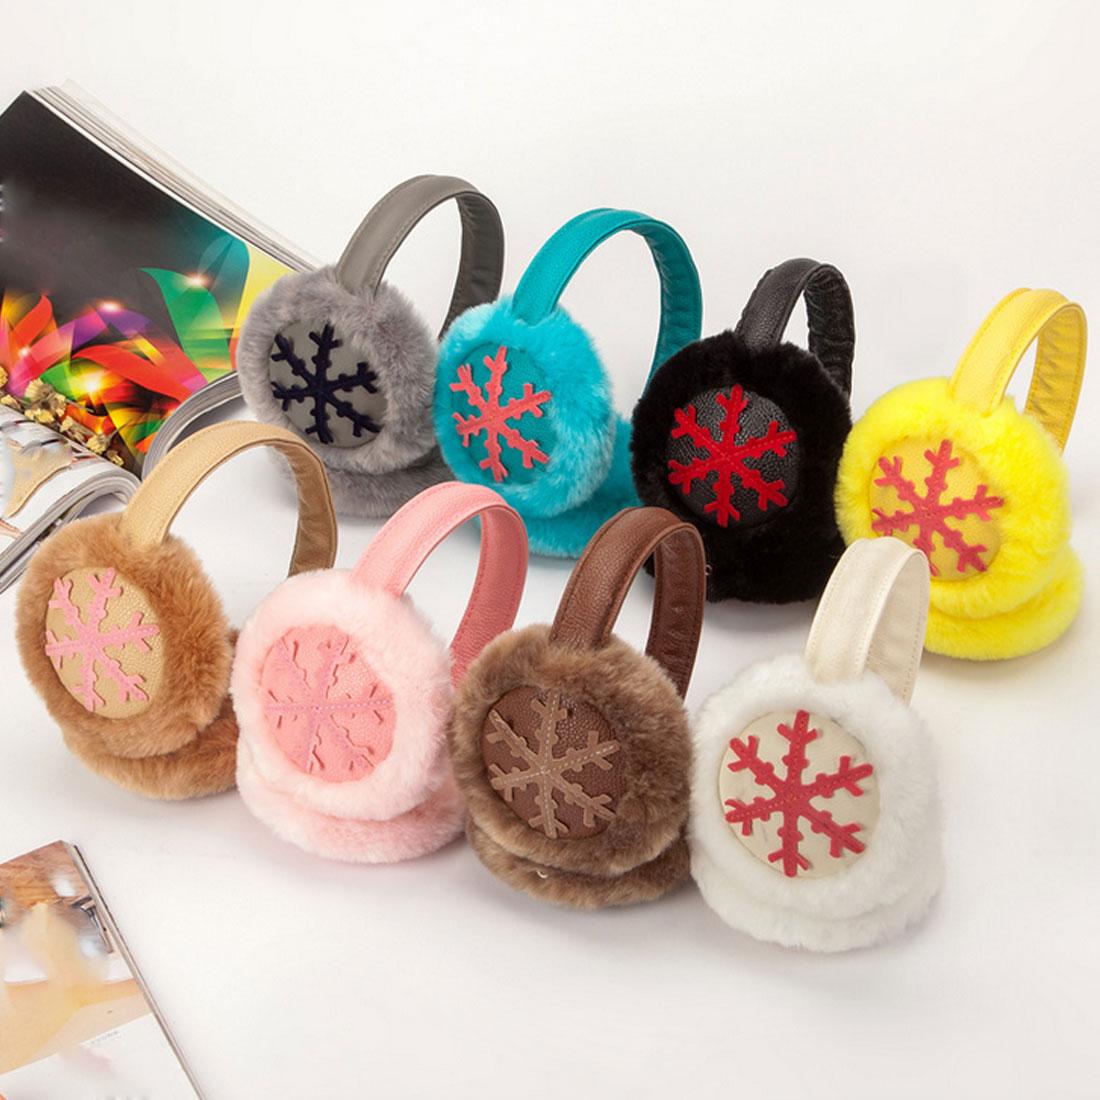 Charming Women Fashion Winter Music Earmuff Headphones Fur Plush Warm Earmuffs Music Earphones Protector Fur Warmers